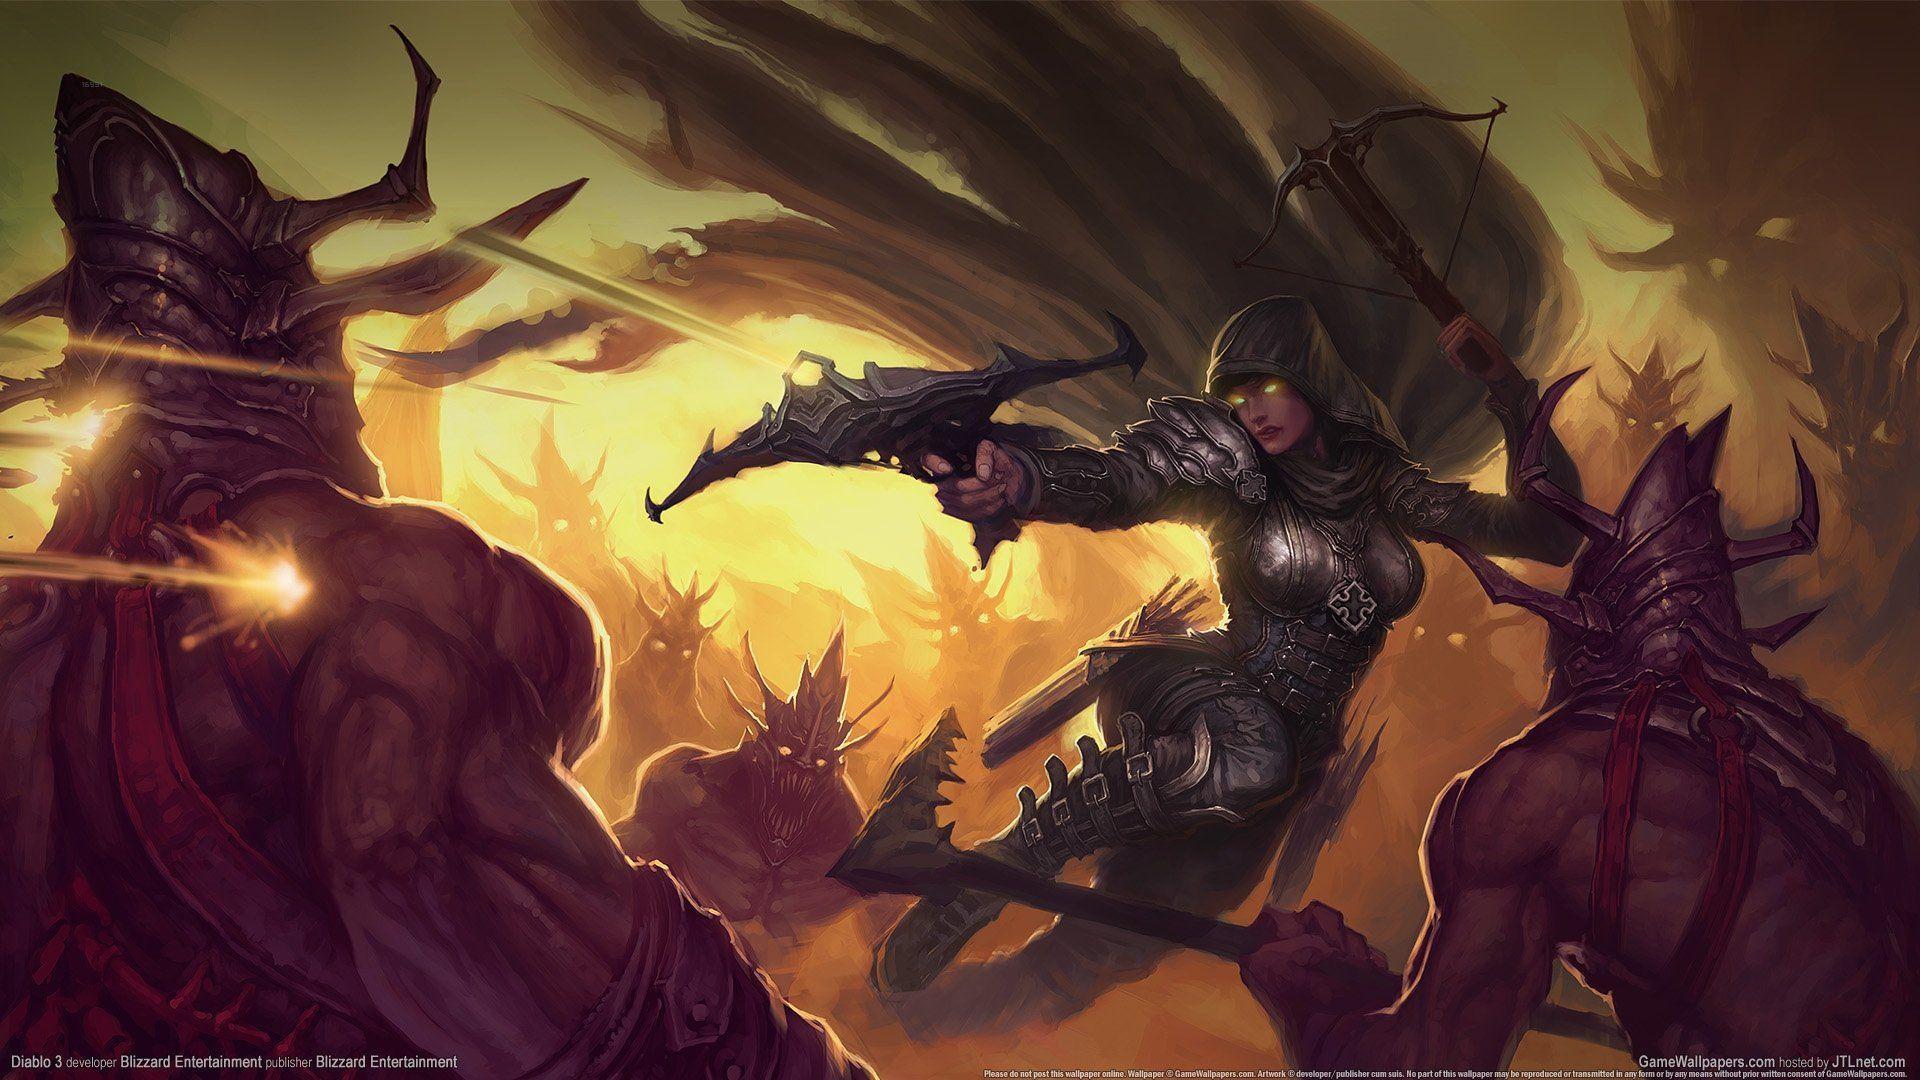 Demon Hunter Diablo 3 Wallpapers Wallpaper Cave